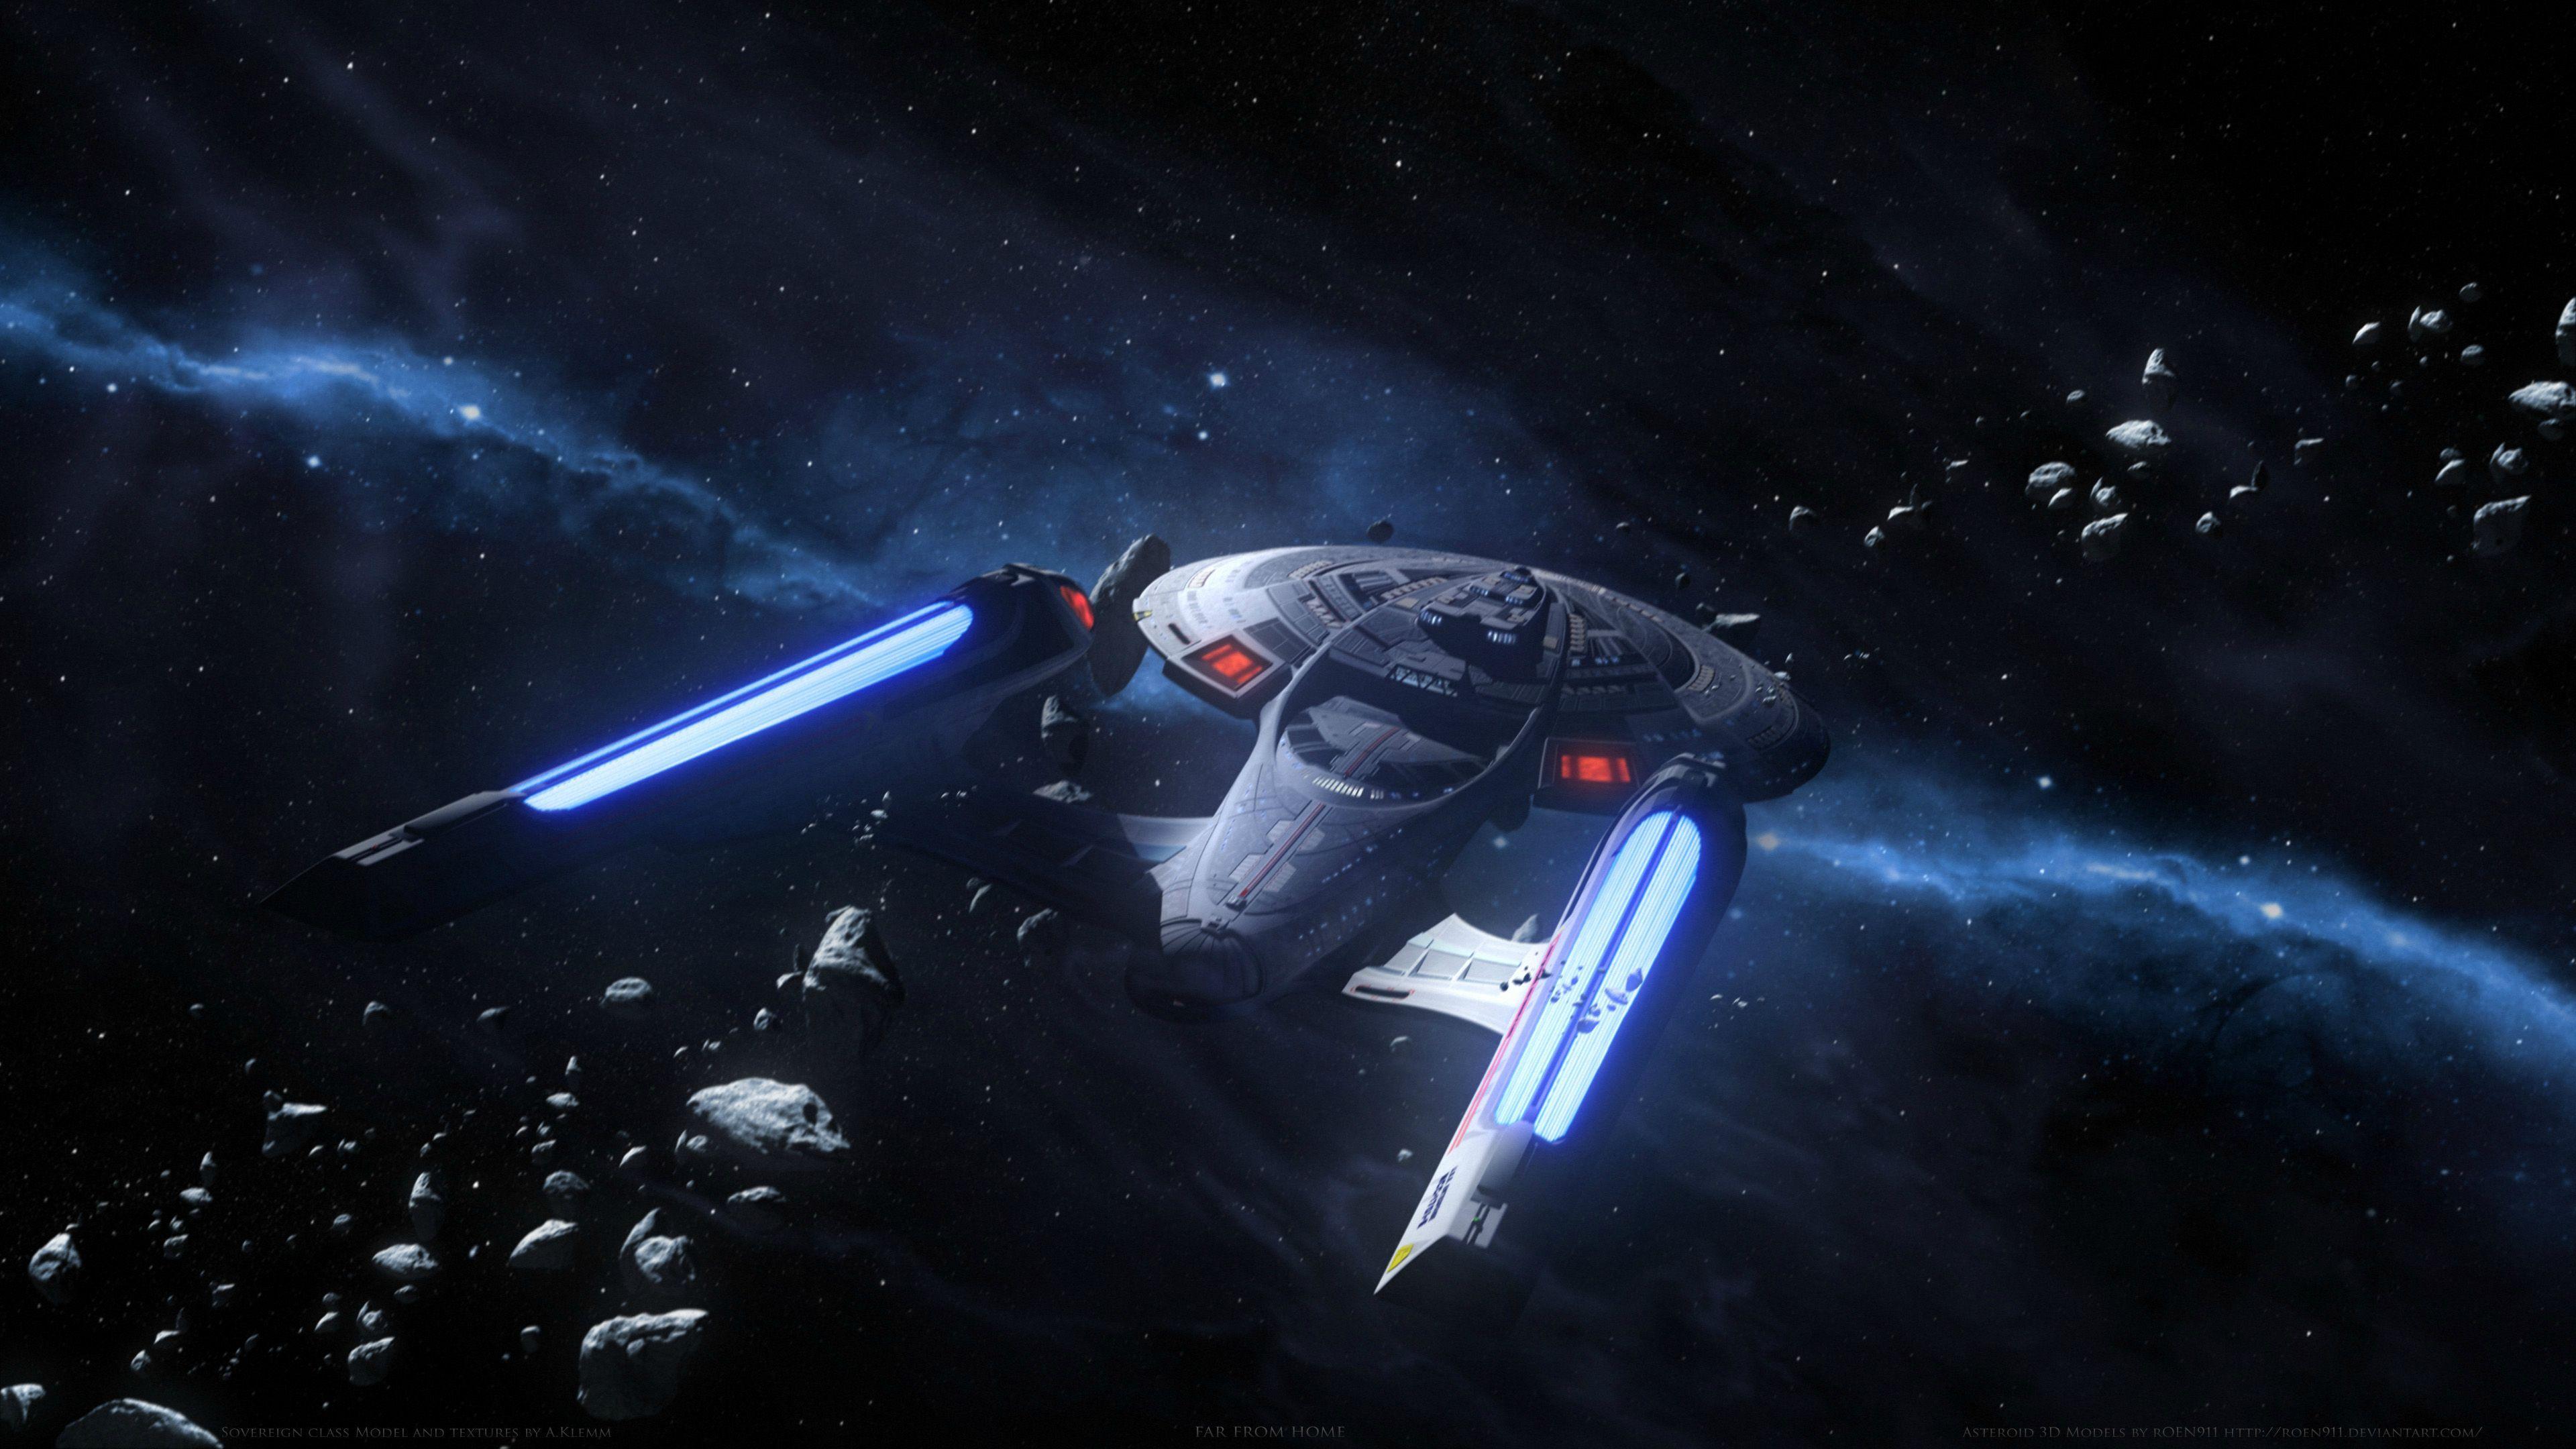 Star Trek 4k Wallpapers Top Free Star Trek 4k Backgrounds Wallpaperaccess